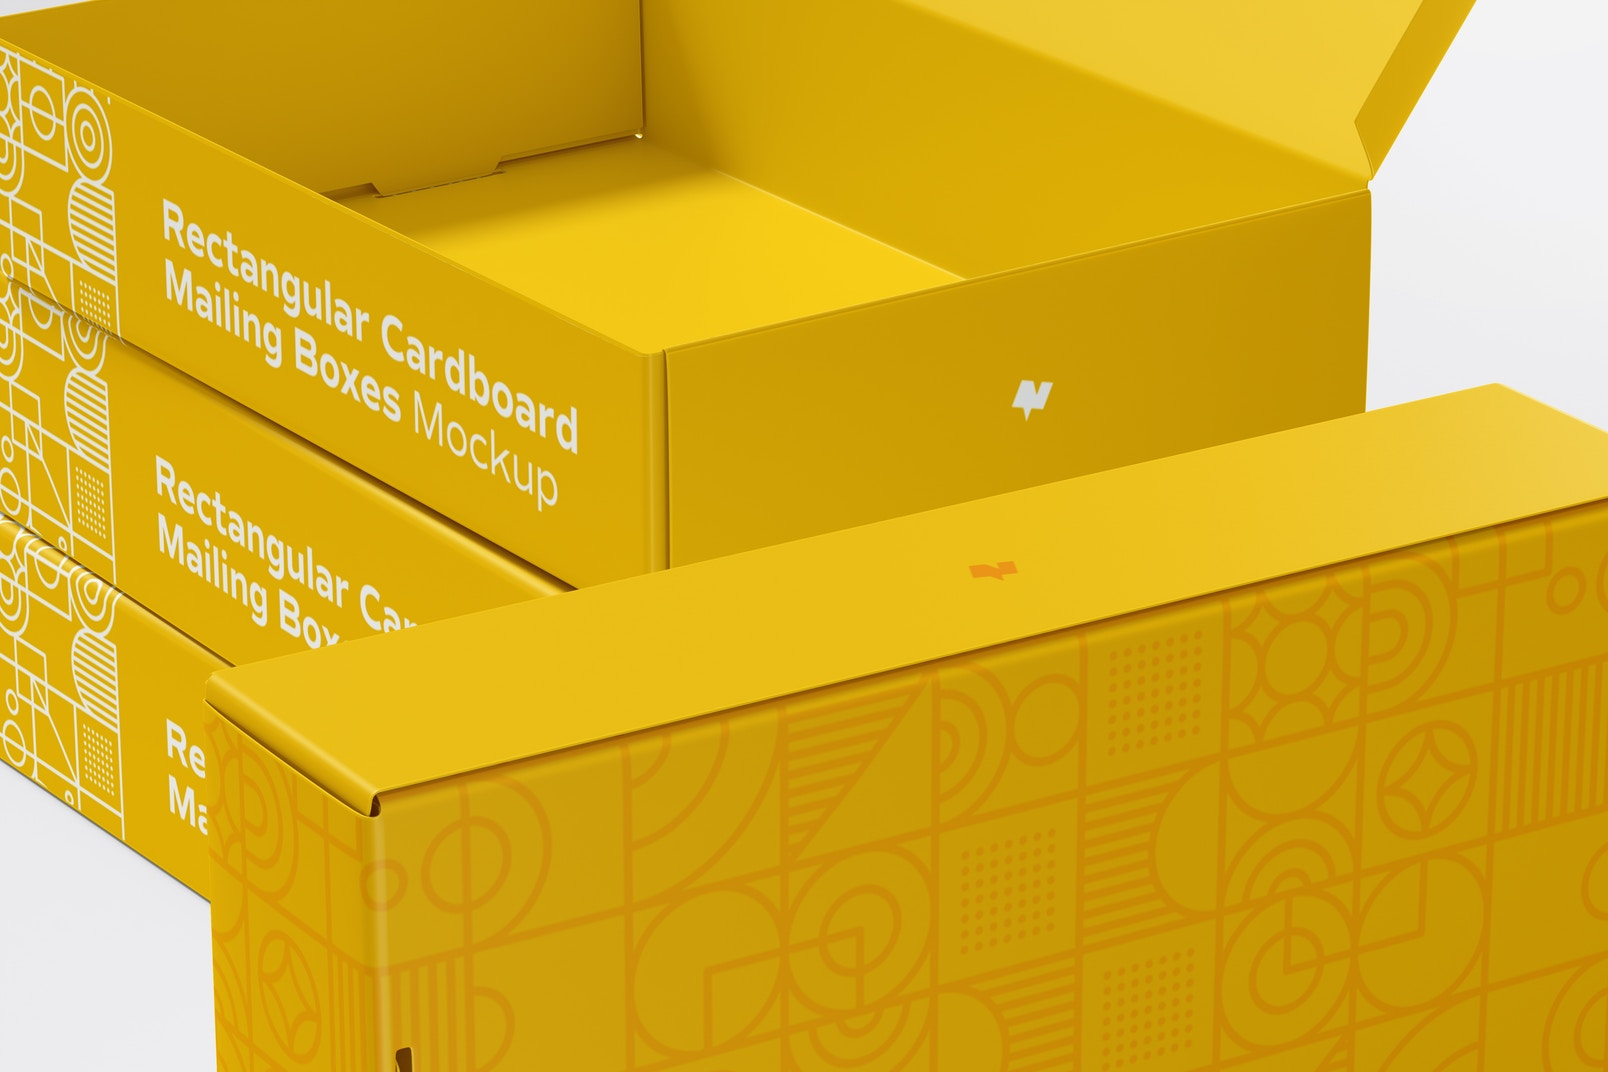 Rectangular Cardboard Mailing Boxes Mockup, Close Up